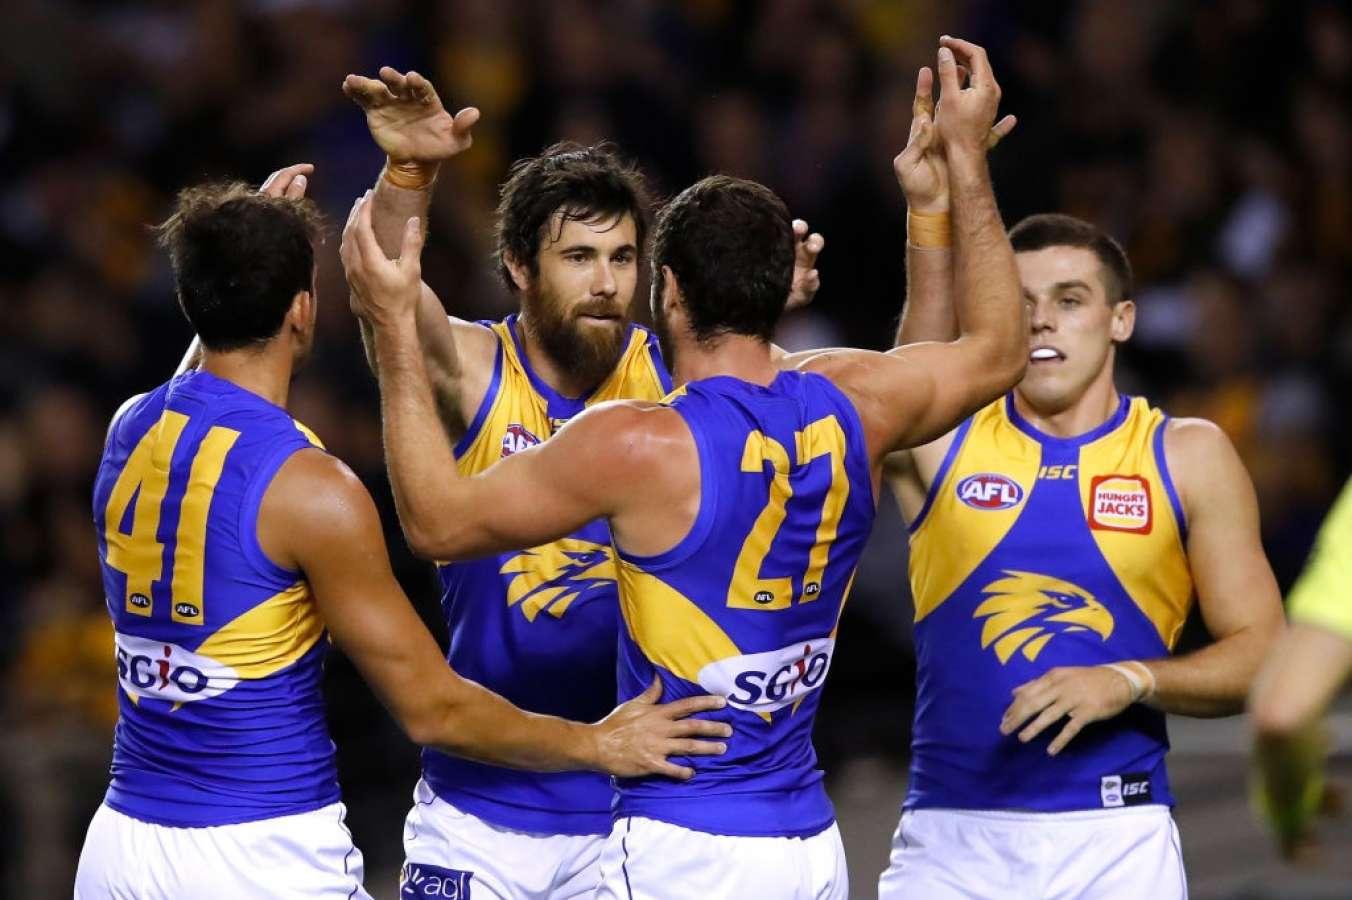 AFL Futures: Round 10 Betting Update